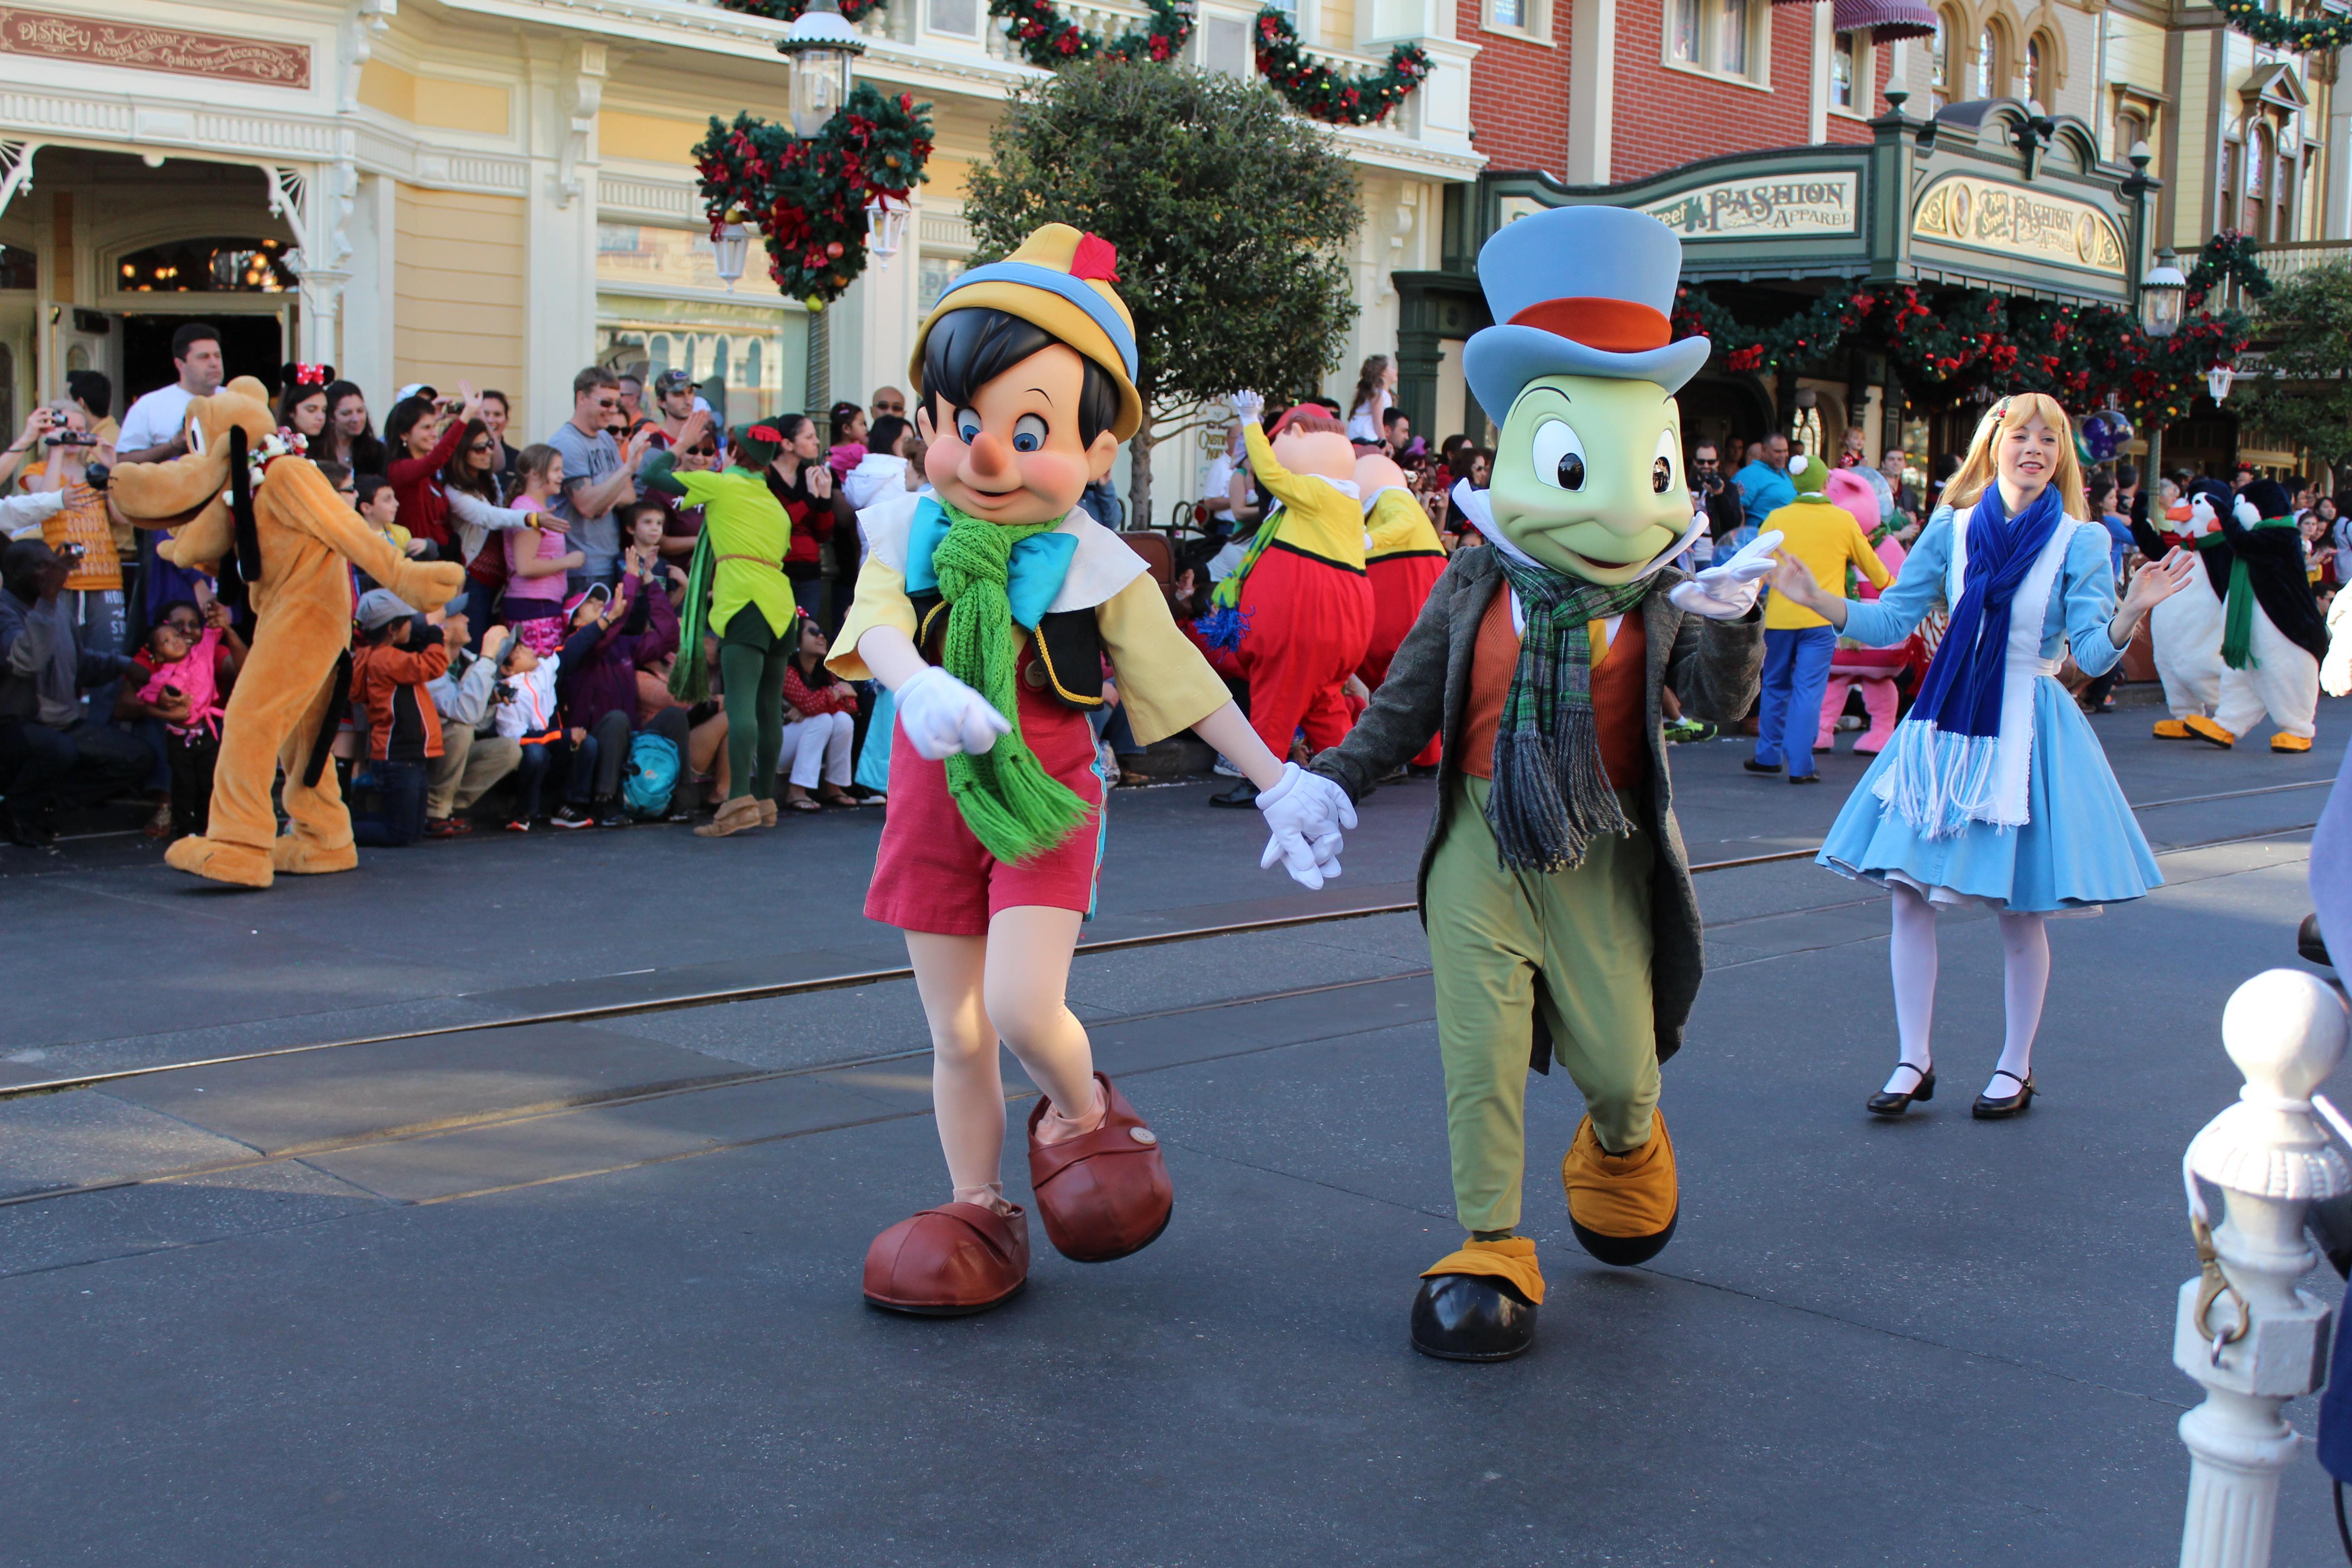 Jiminy Cricket and Old Pinocchio